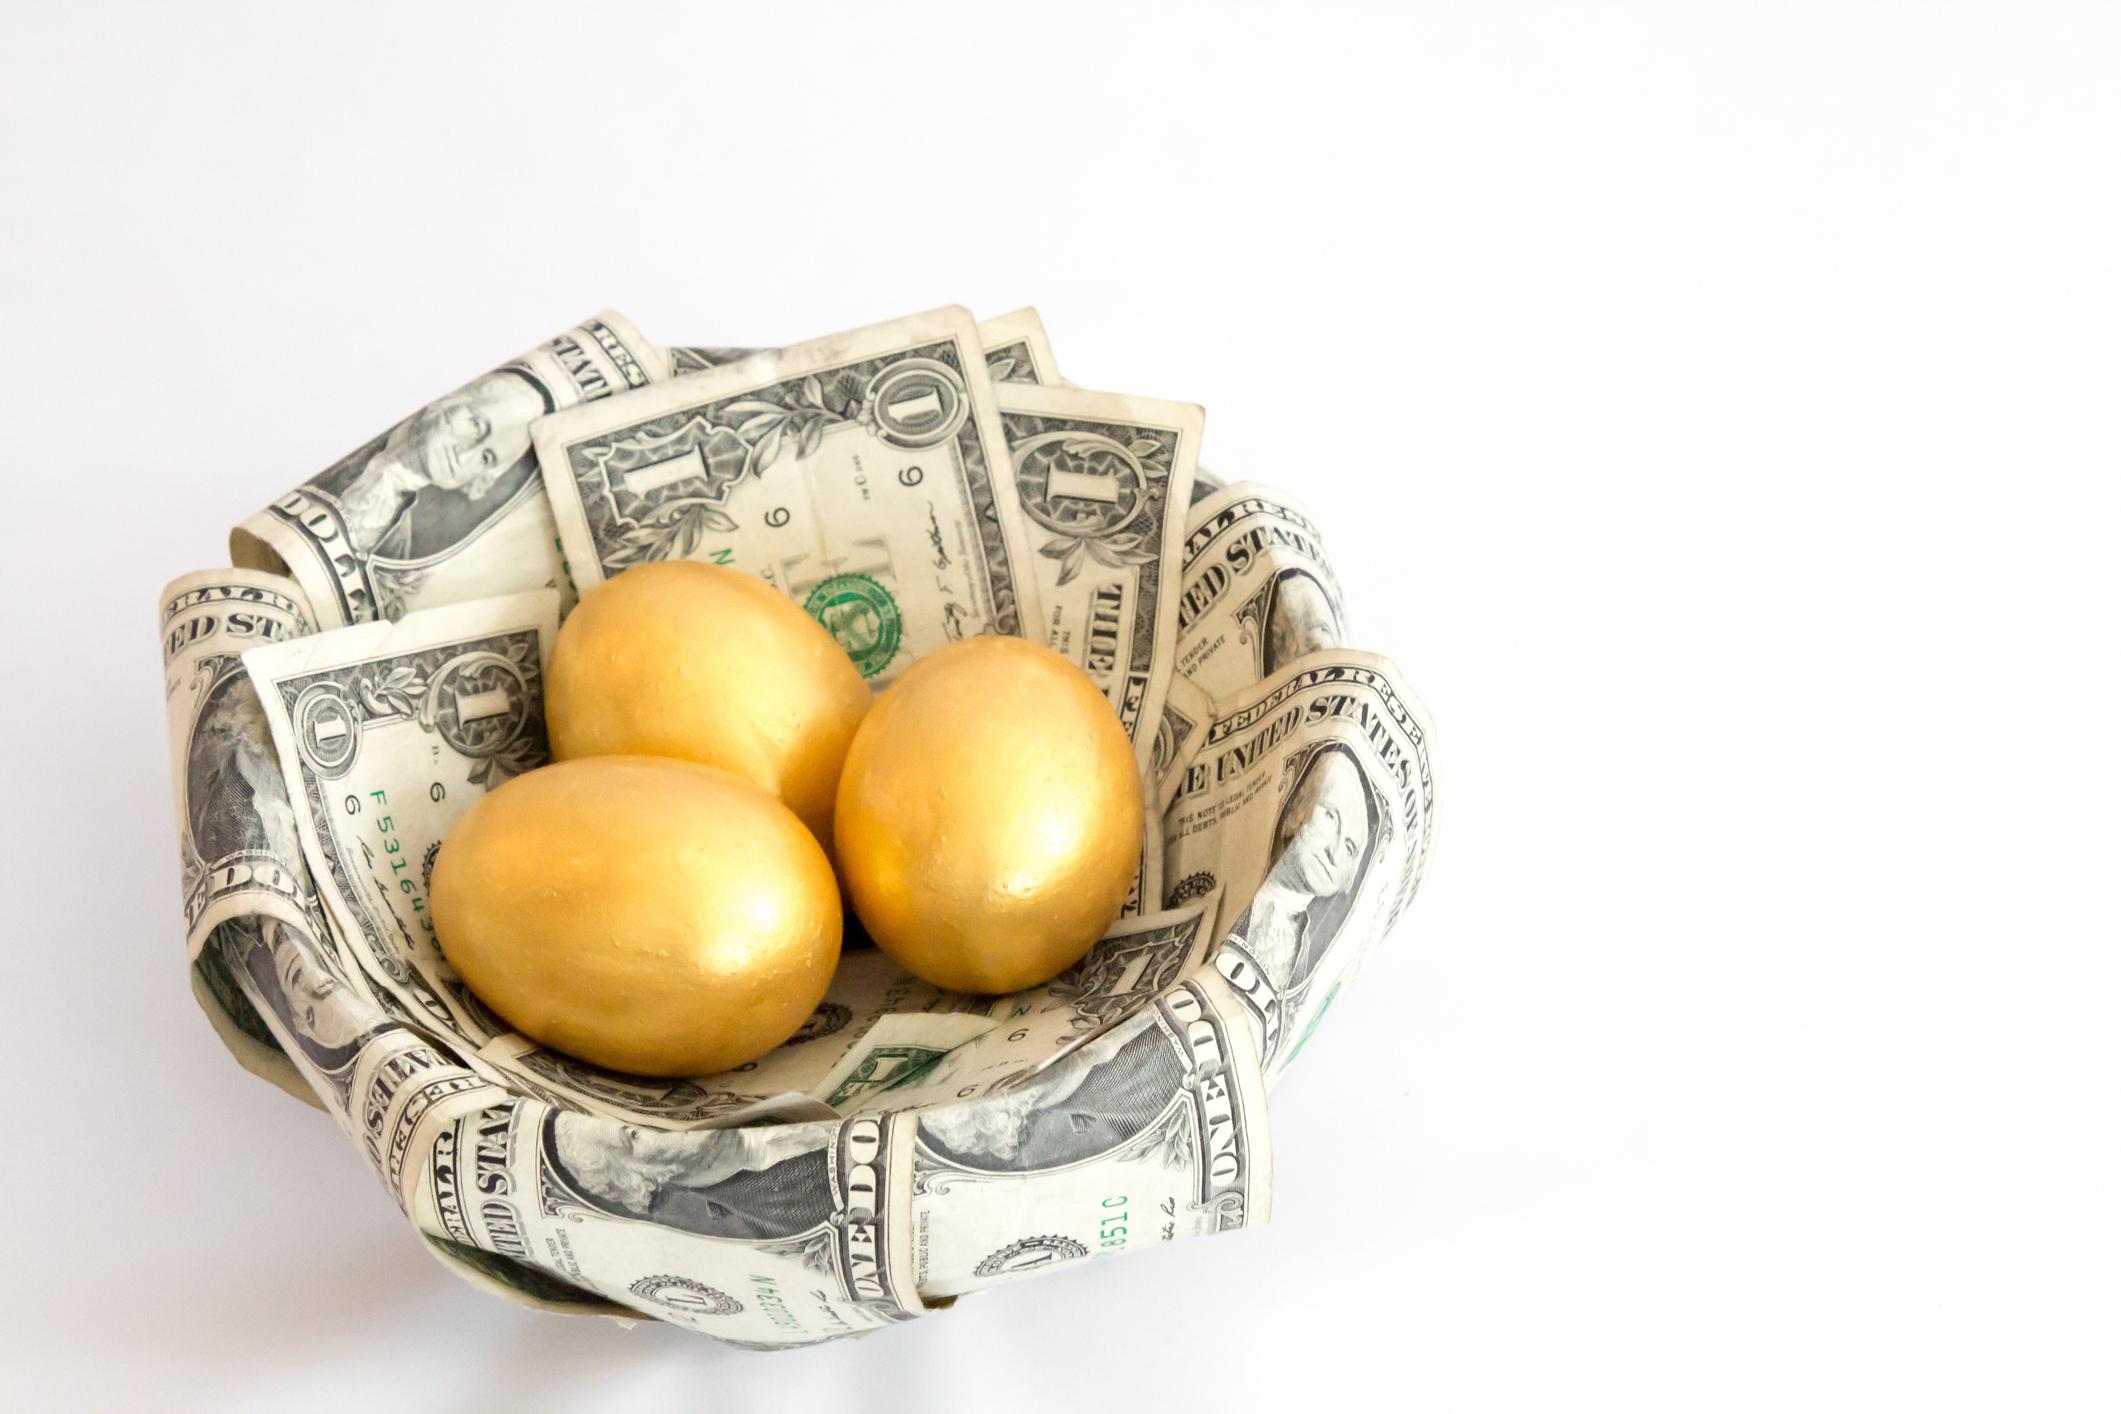 Three golden eggs lying in a basket made of dollar bills.